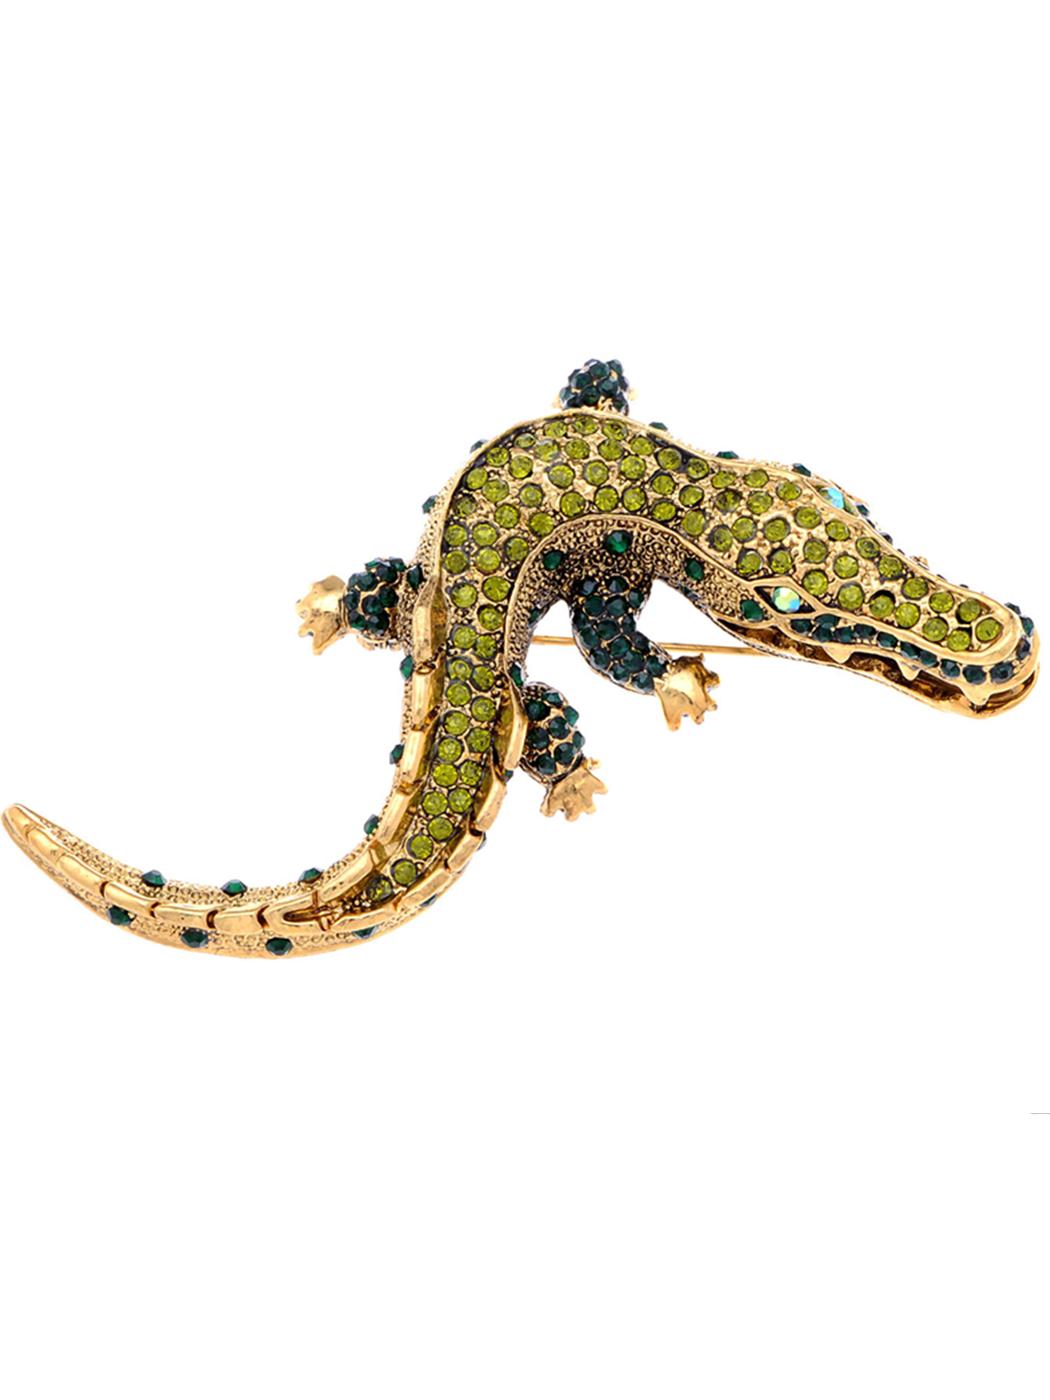 Feinuhan Yellow Golden Tone Green Rhinestones Baby Alligator Crocodile Brooch Pin